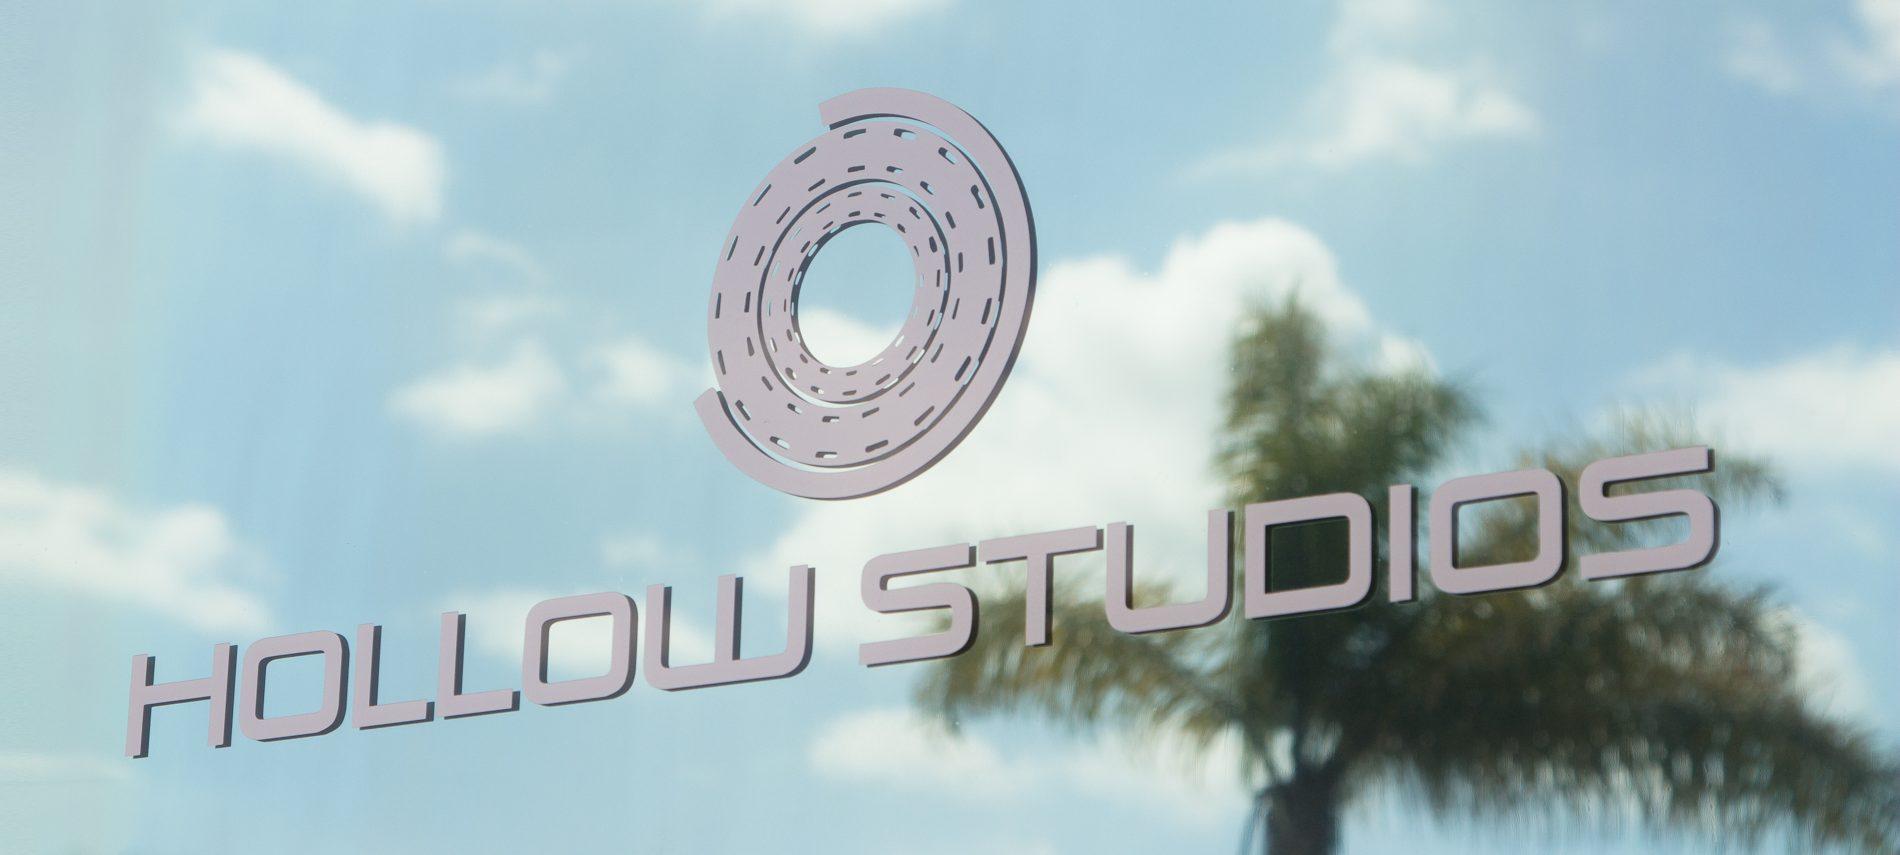 hollow studios